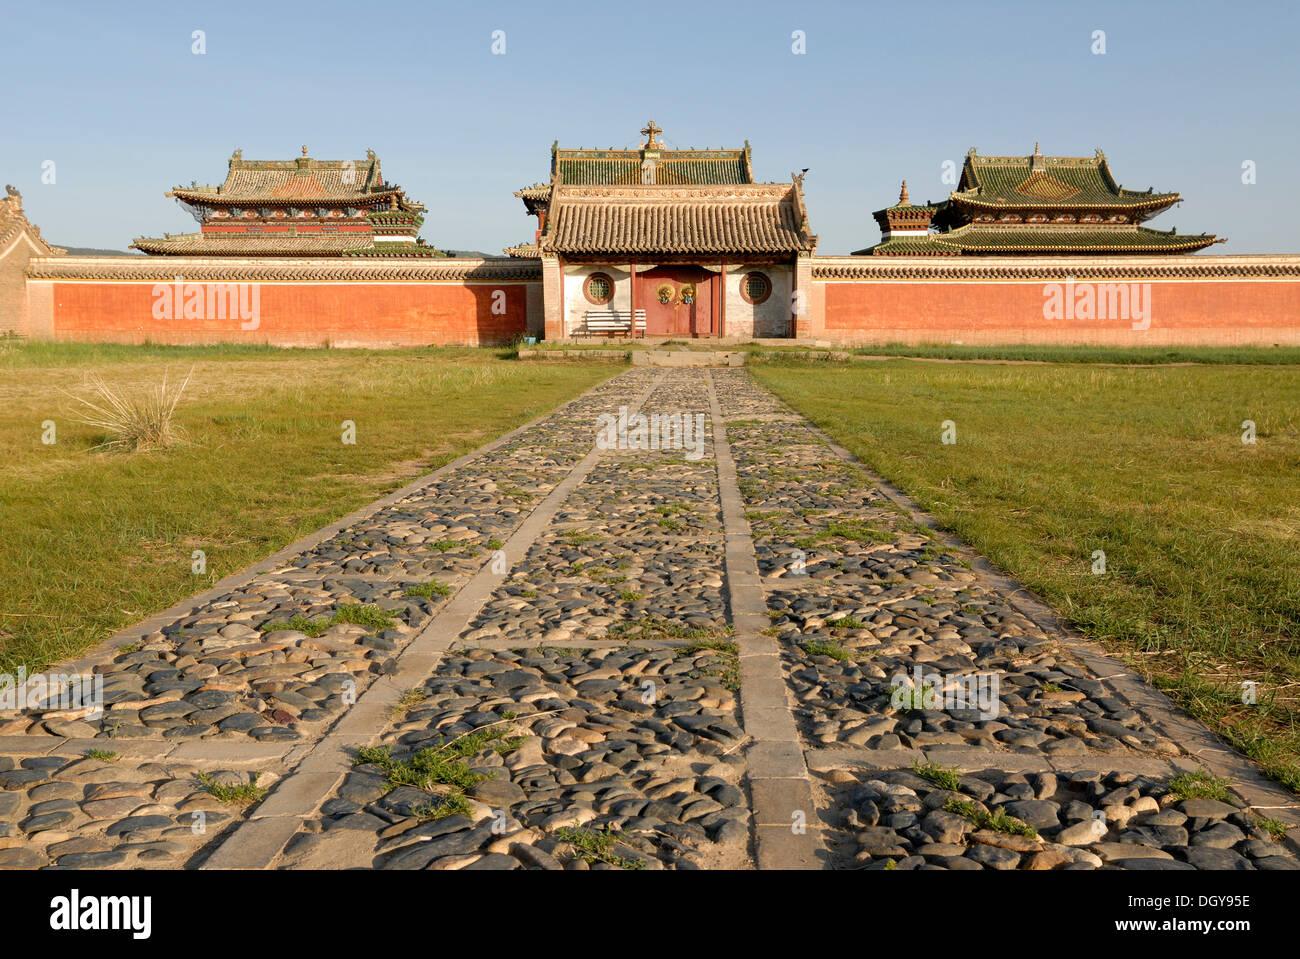 Temple in the inner complex of Erdene Zuu Khiid Monastery, Karakorum, Kharkhorin, Oevoerkhangai Aimak, Mongolia, Asia - Stock Image